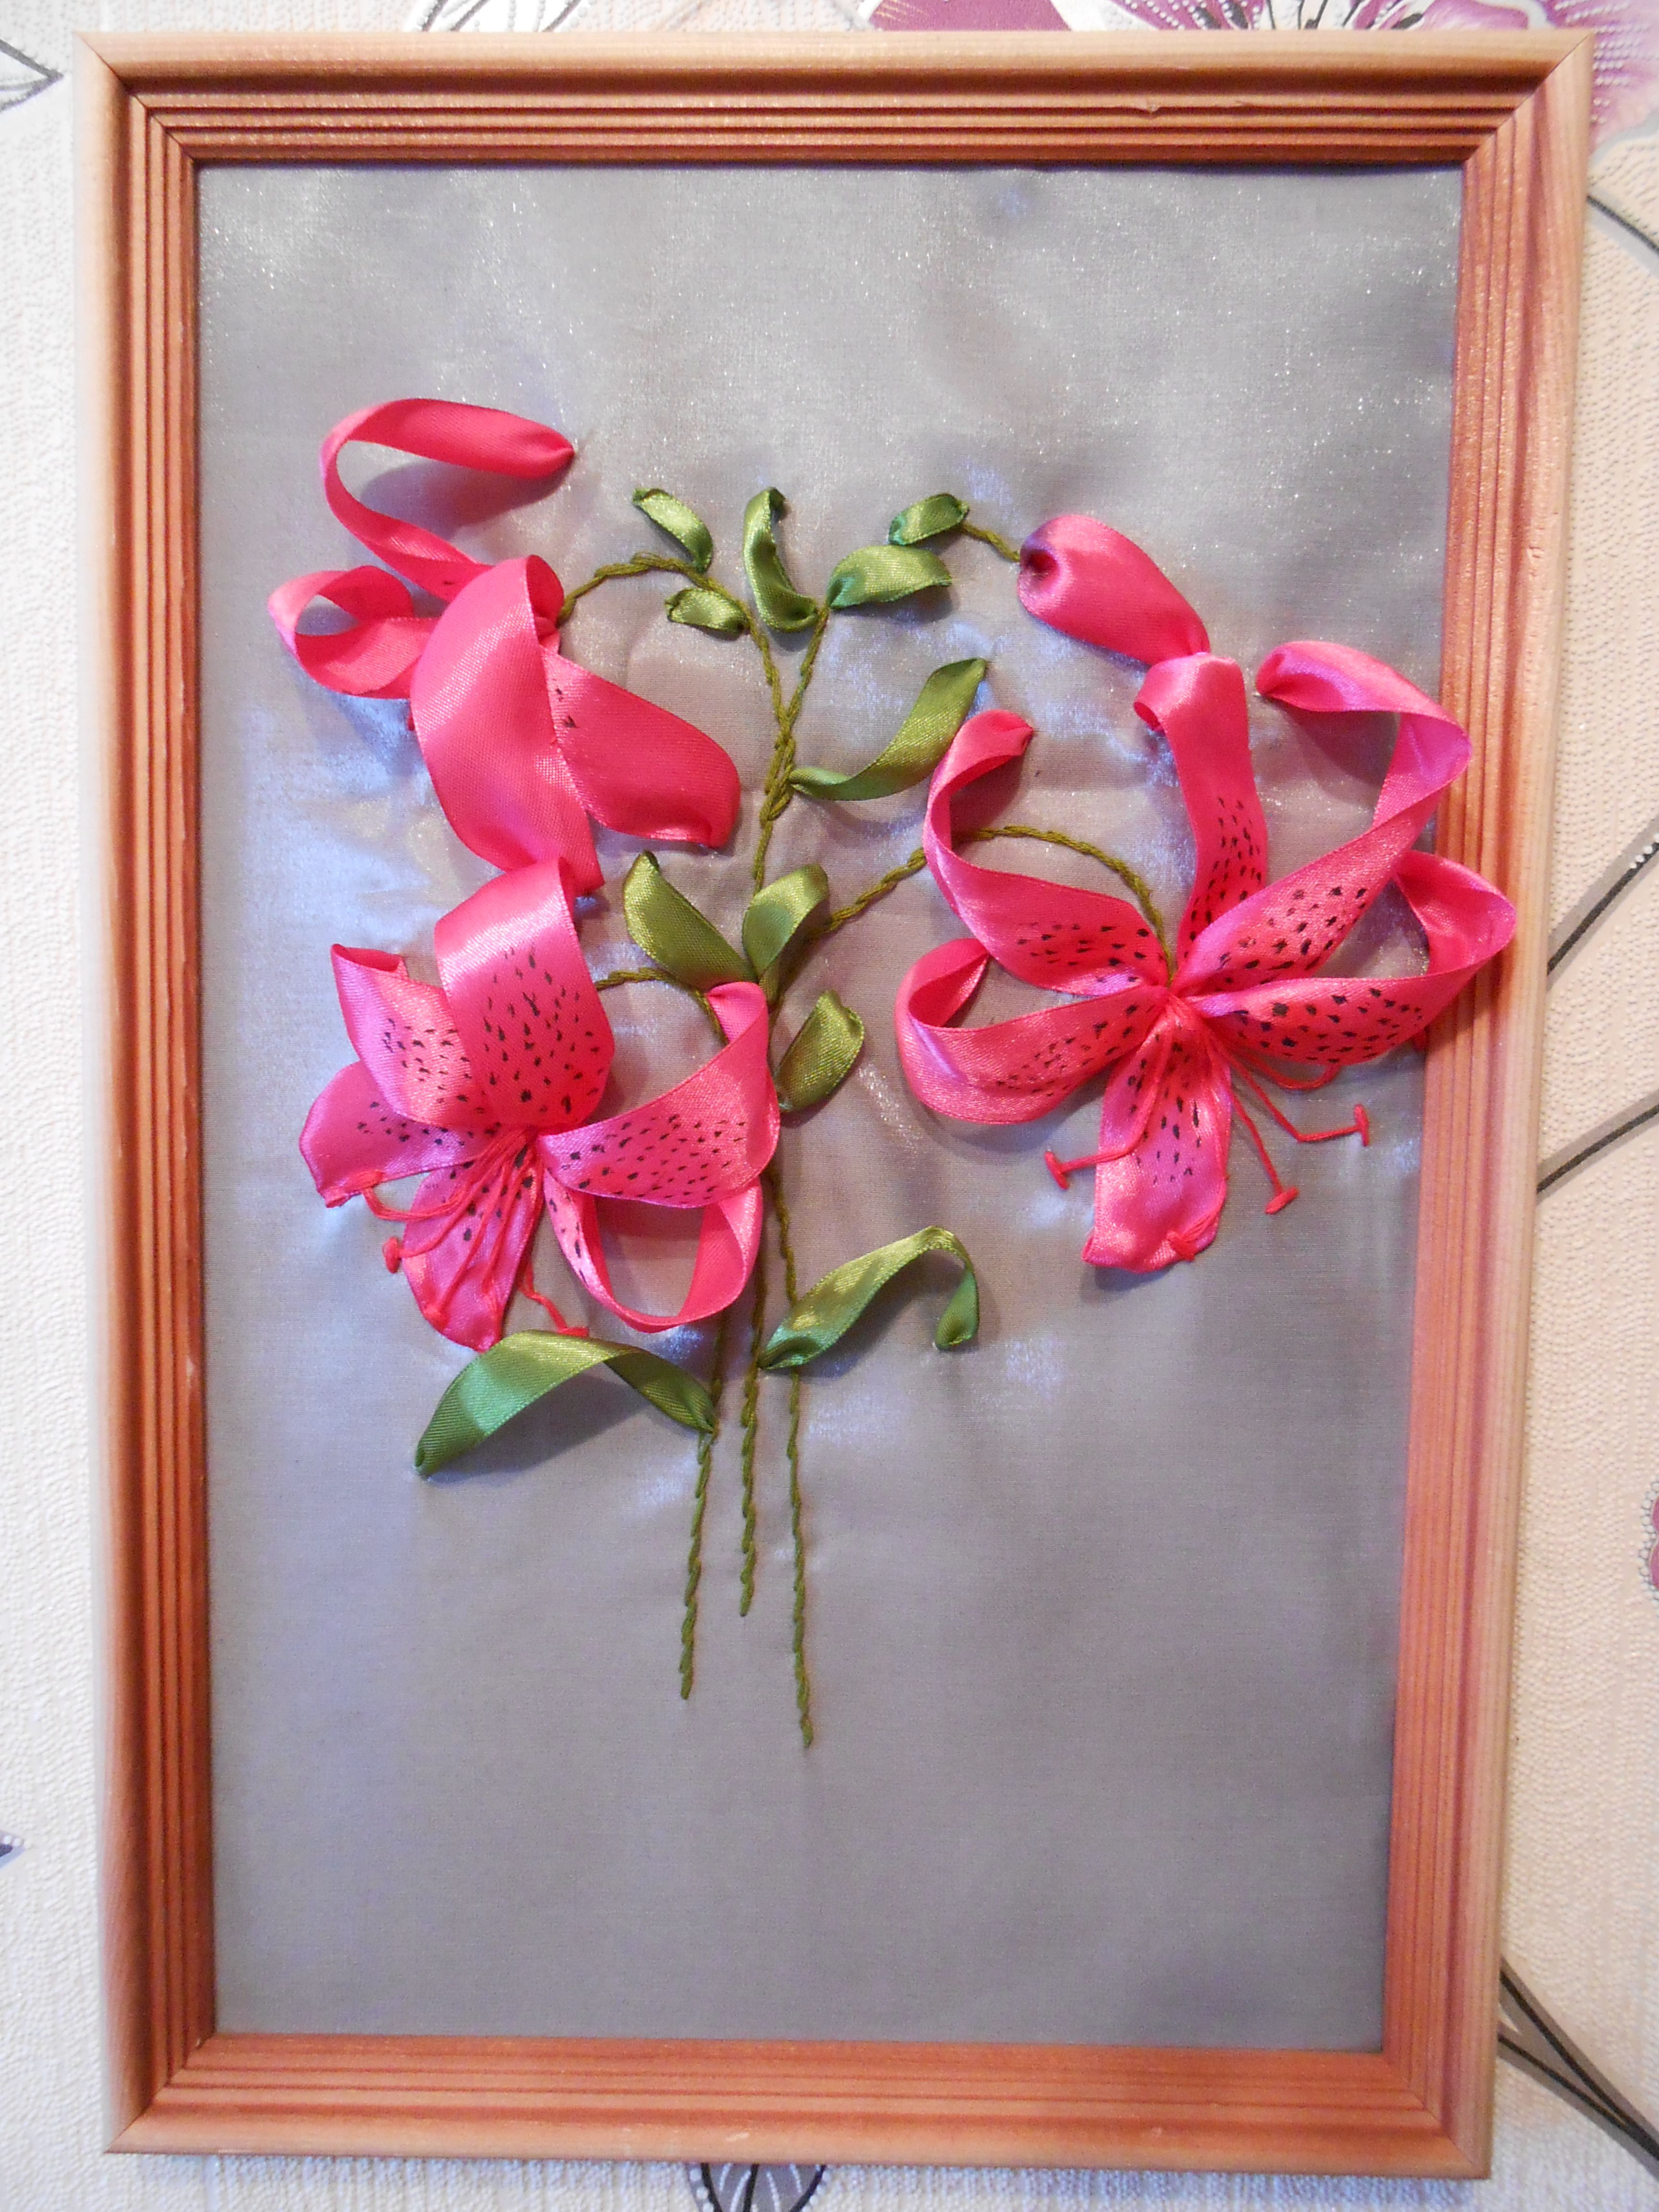 вышивкалентами панно ручнаяработа картина подарок